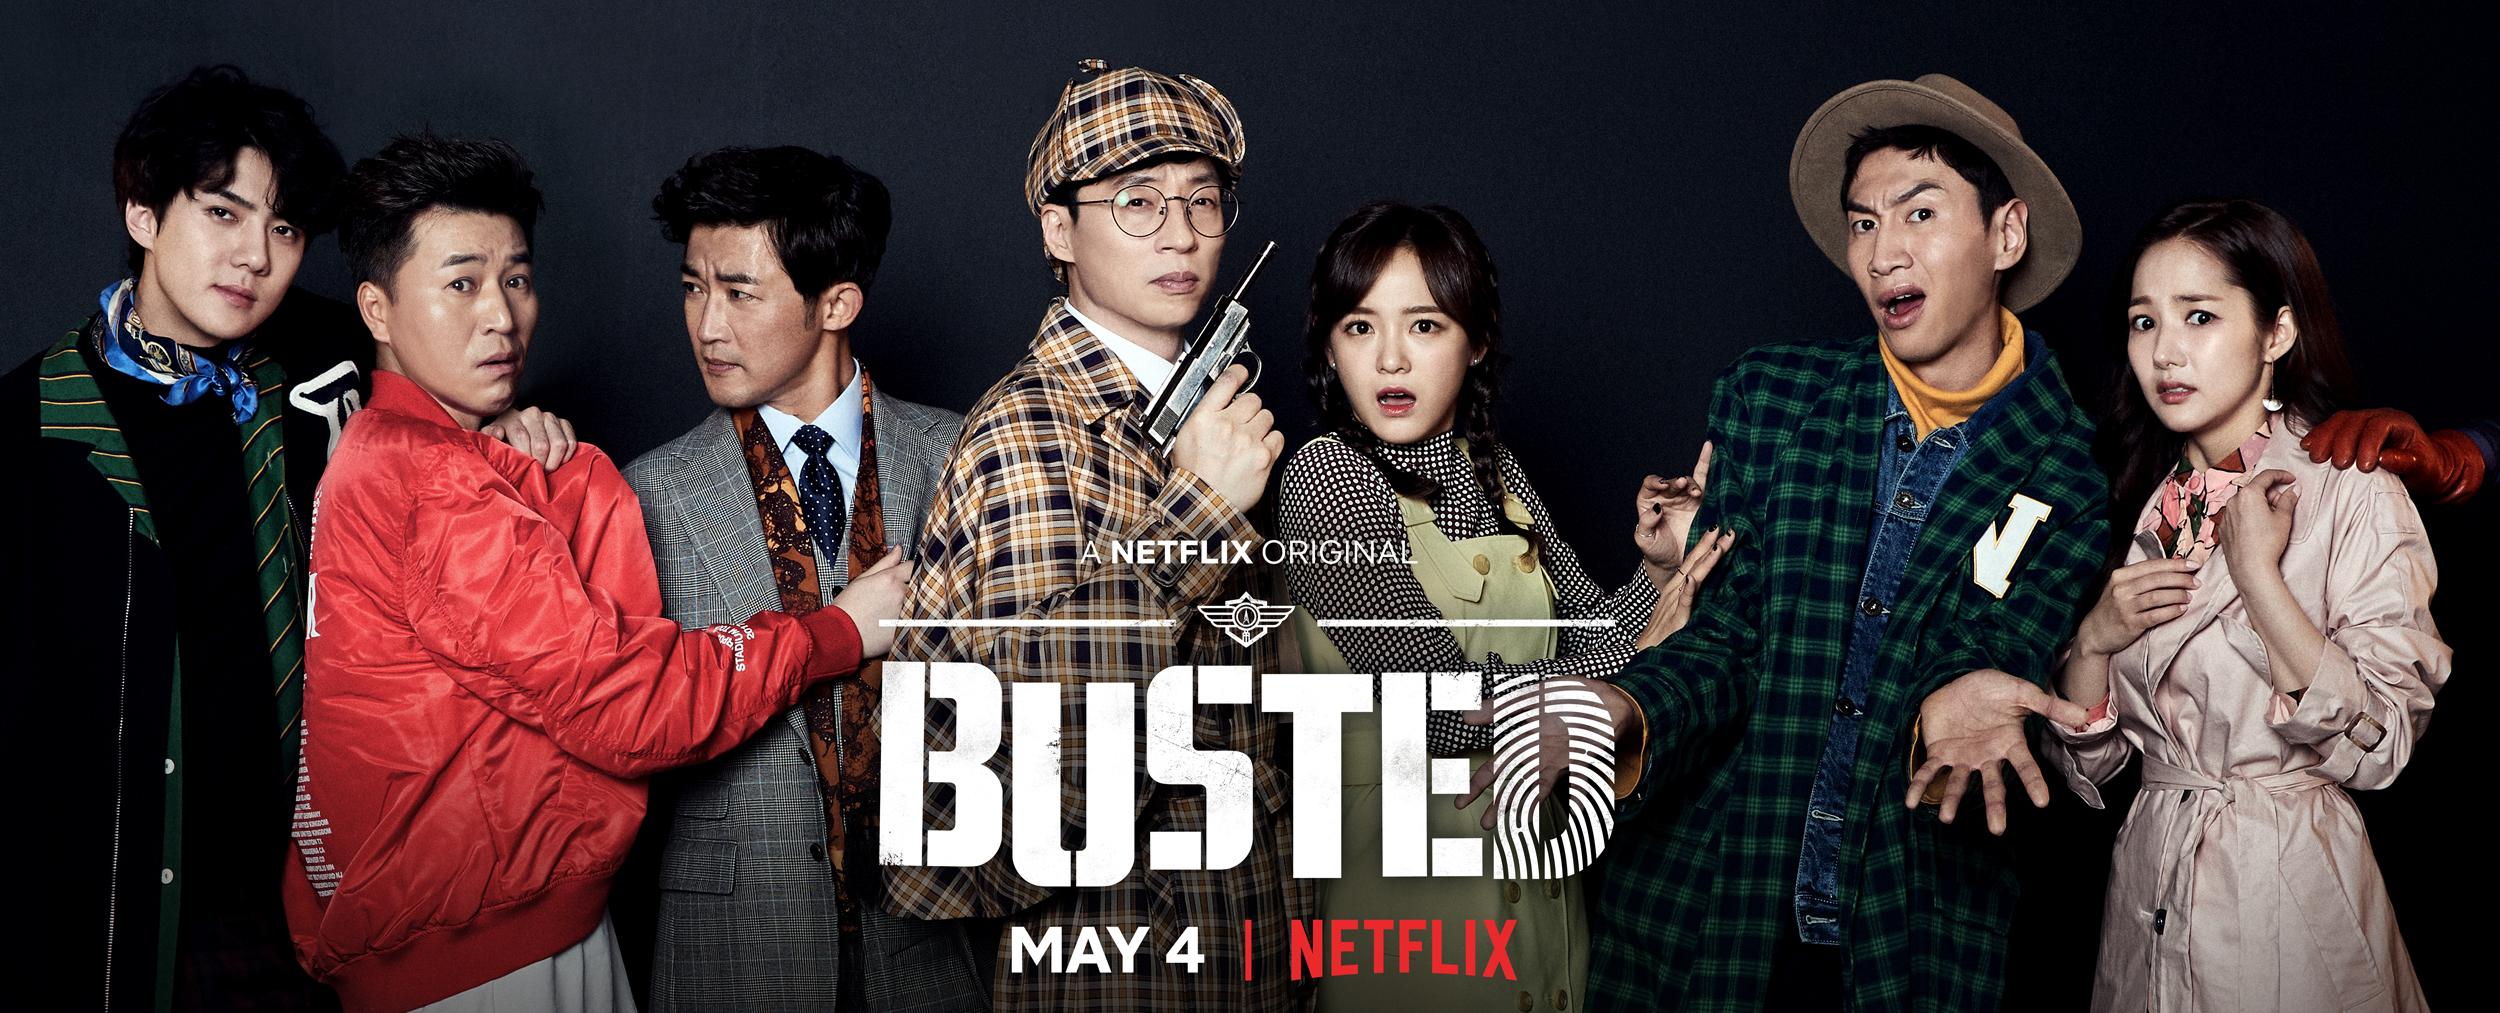 Busted (TV Series 2001– ) - IMDb